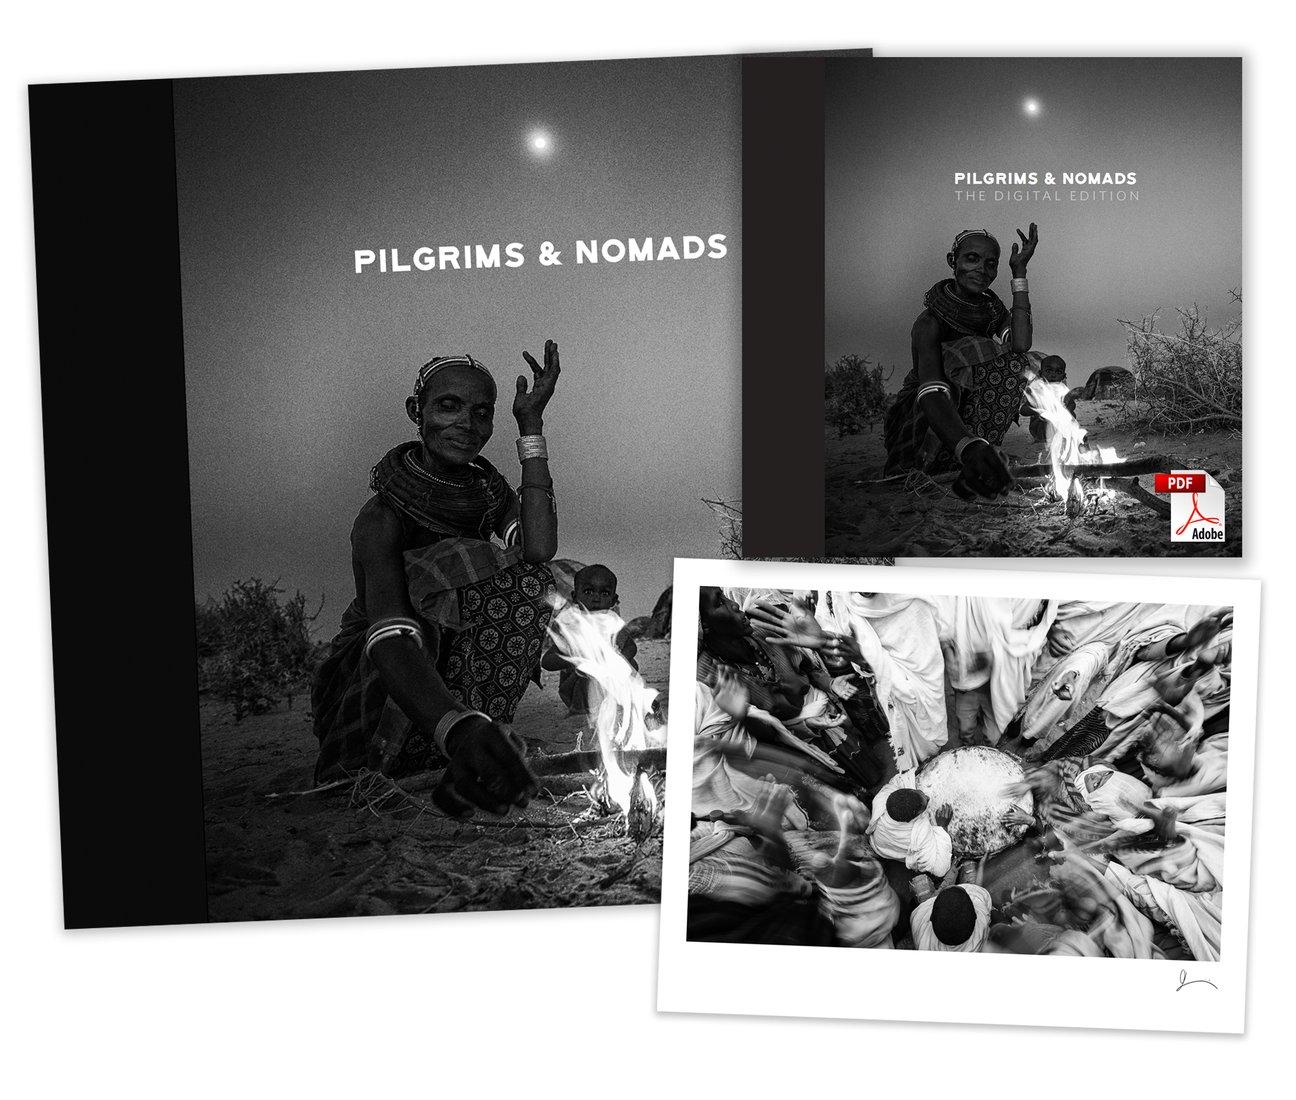 Art: To Like or To Listen? | David duChemin - World & Humanitarian Photographer, Nomad, Author.